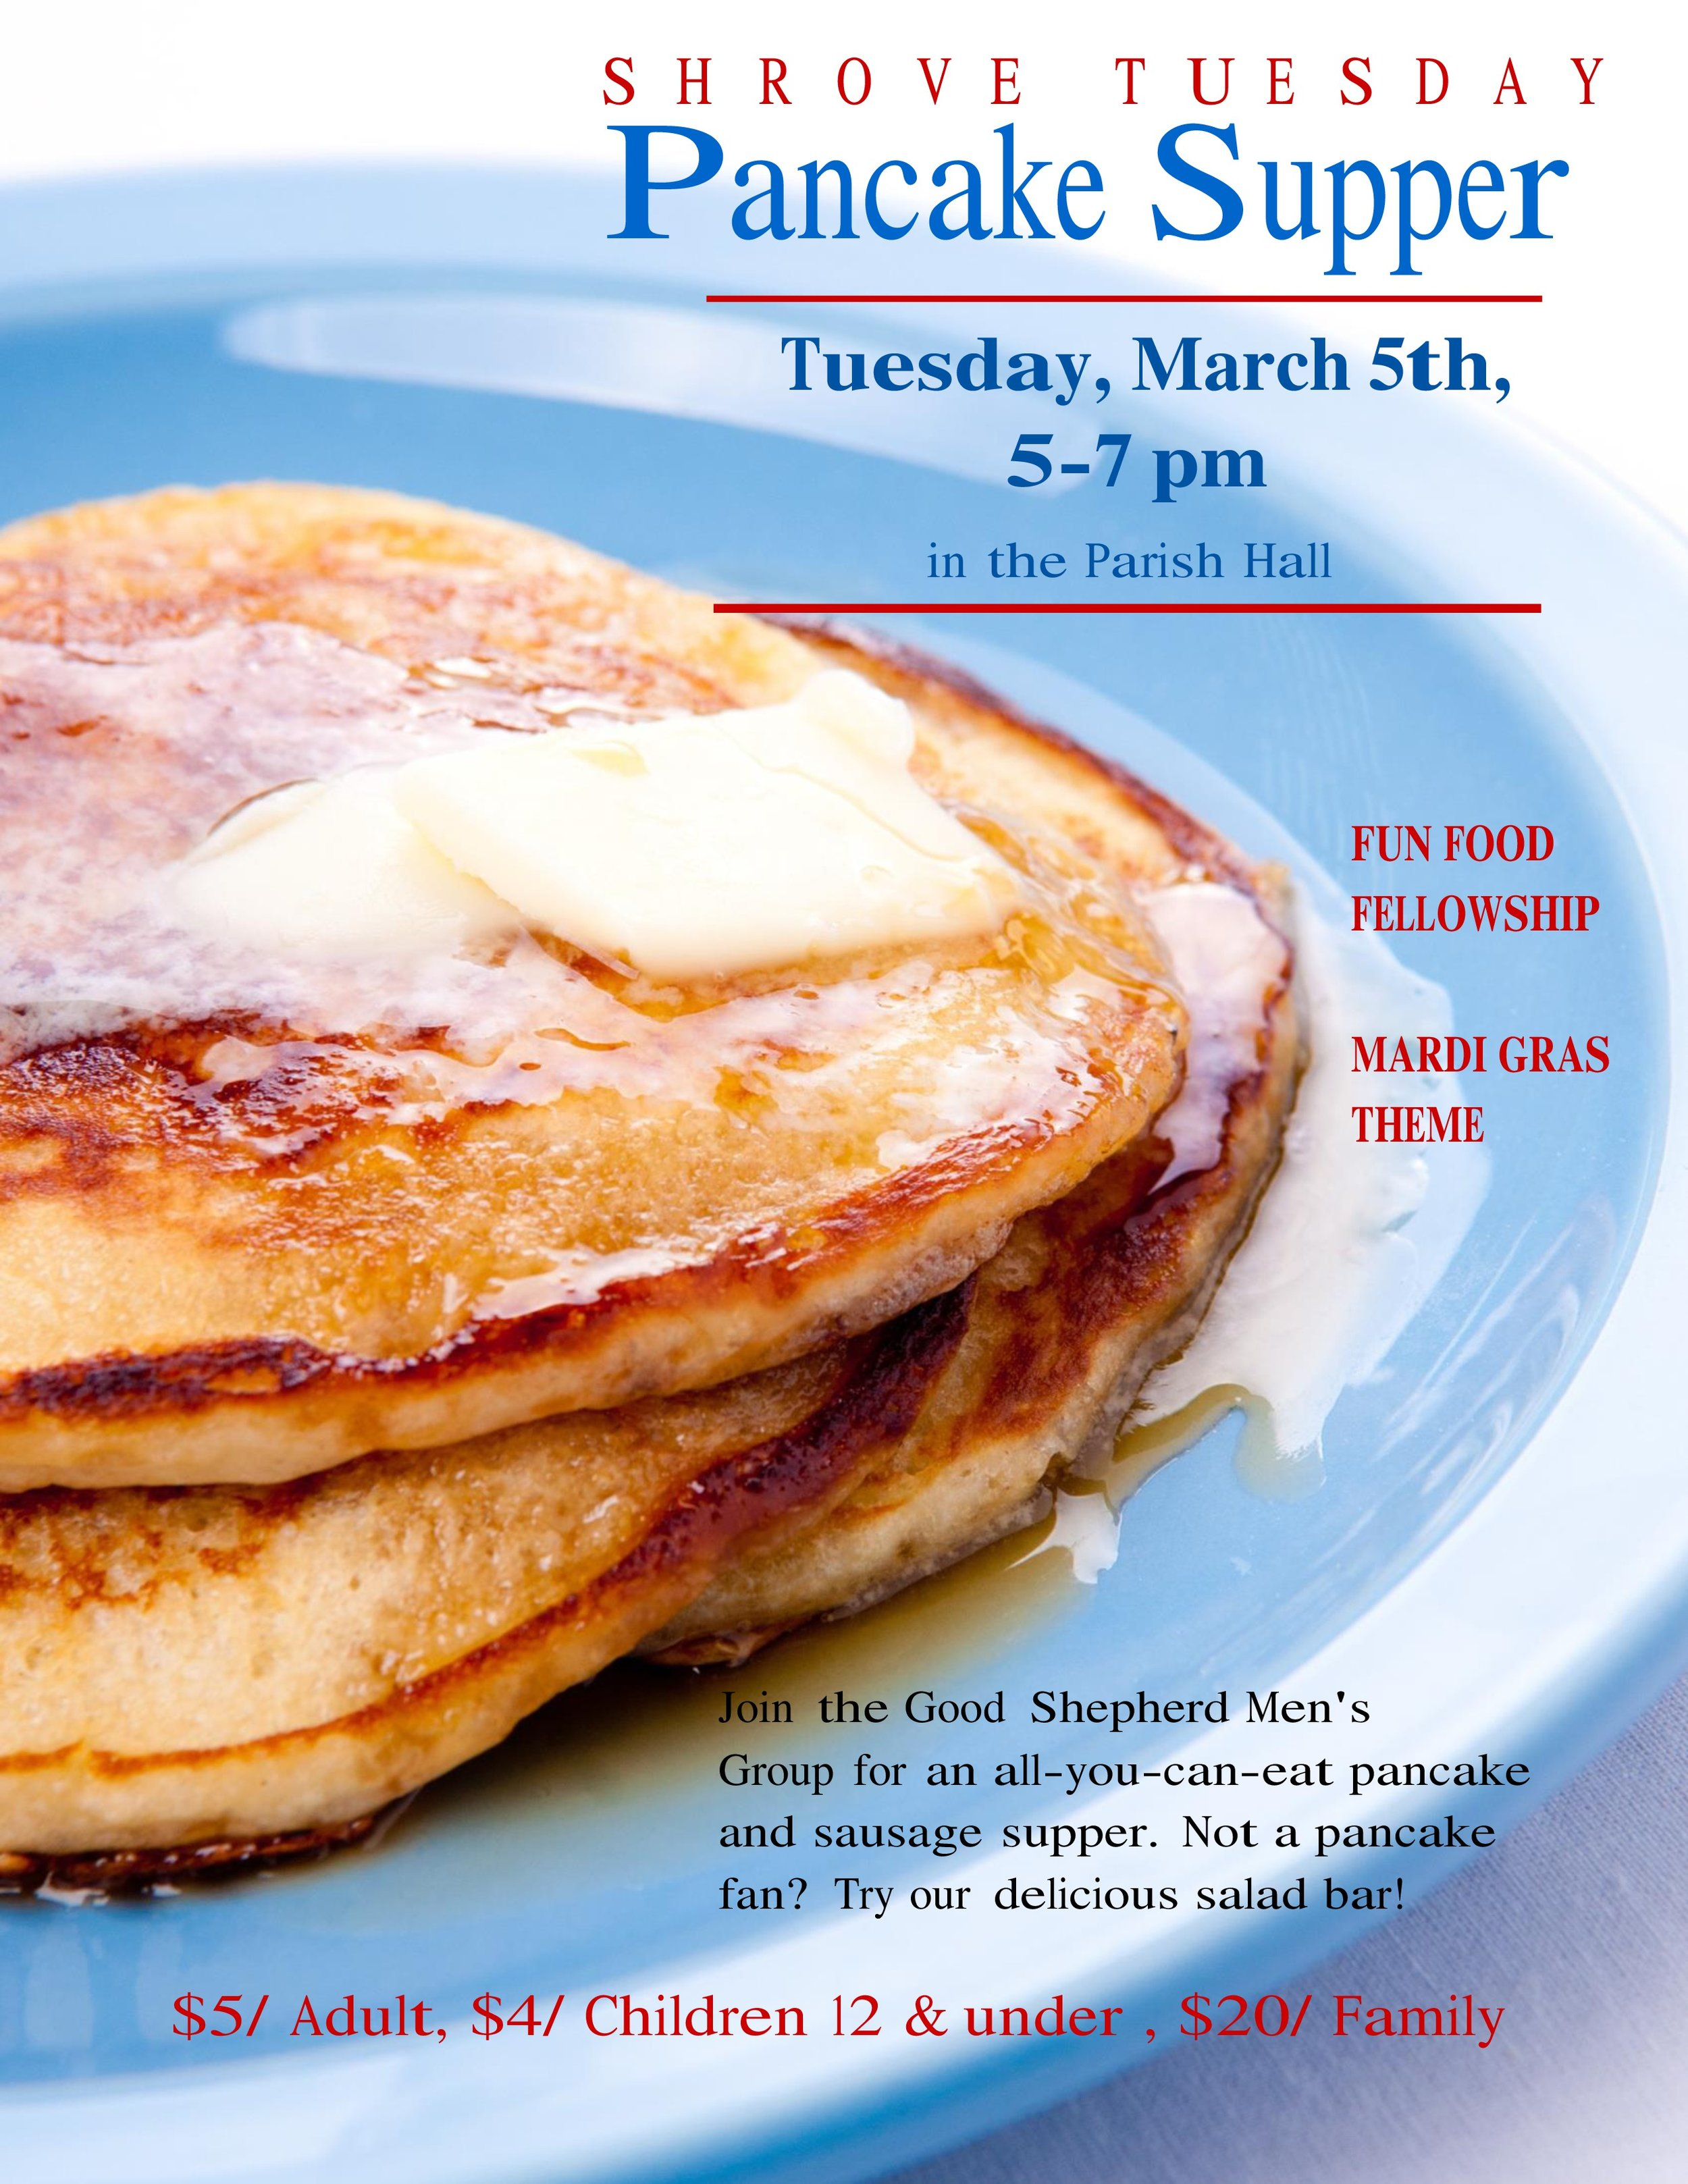 Shrove Tuesday Pancake Dinner Poster 190223-page-0.jpg